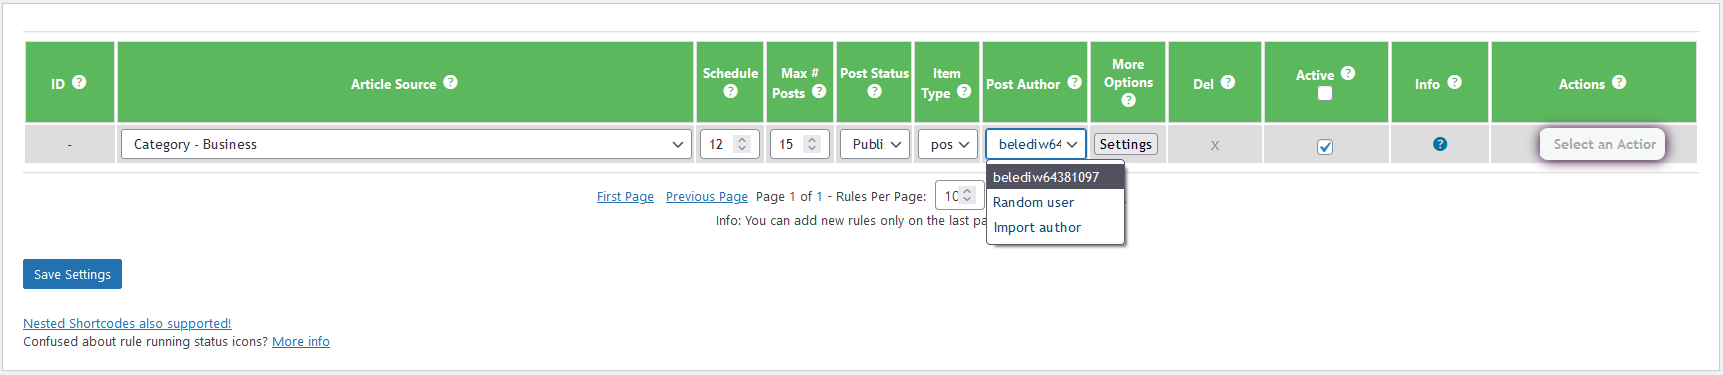 Add custom news posts - 8